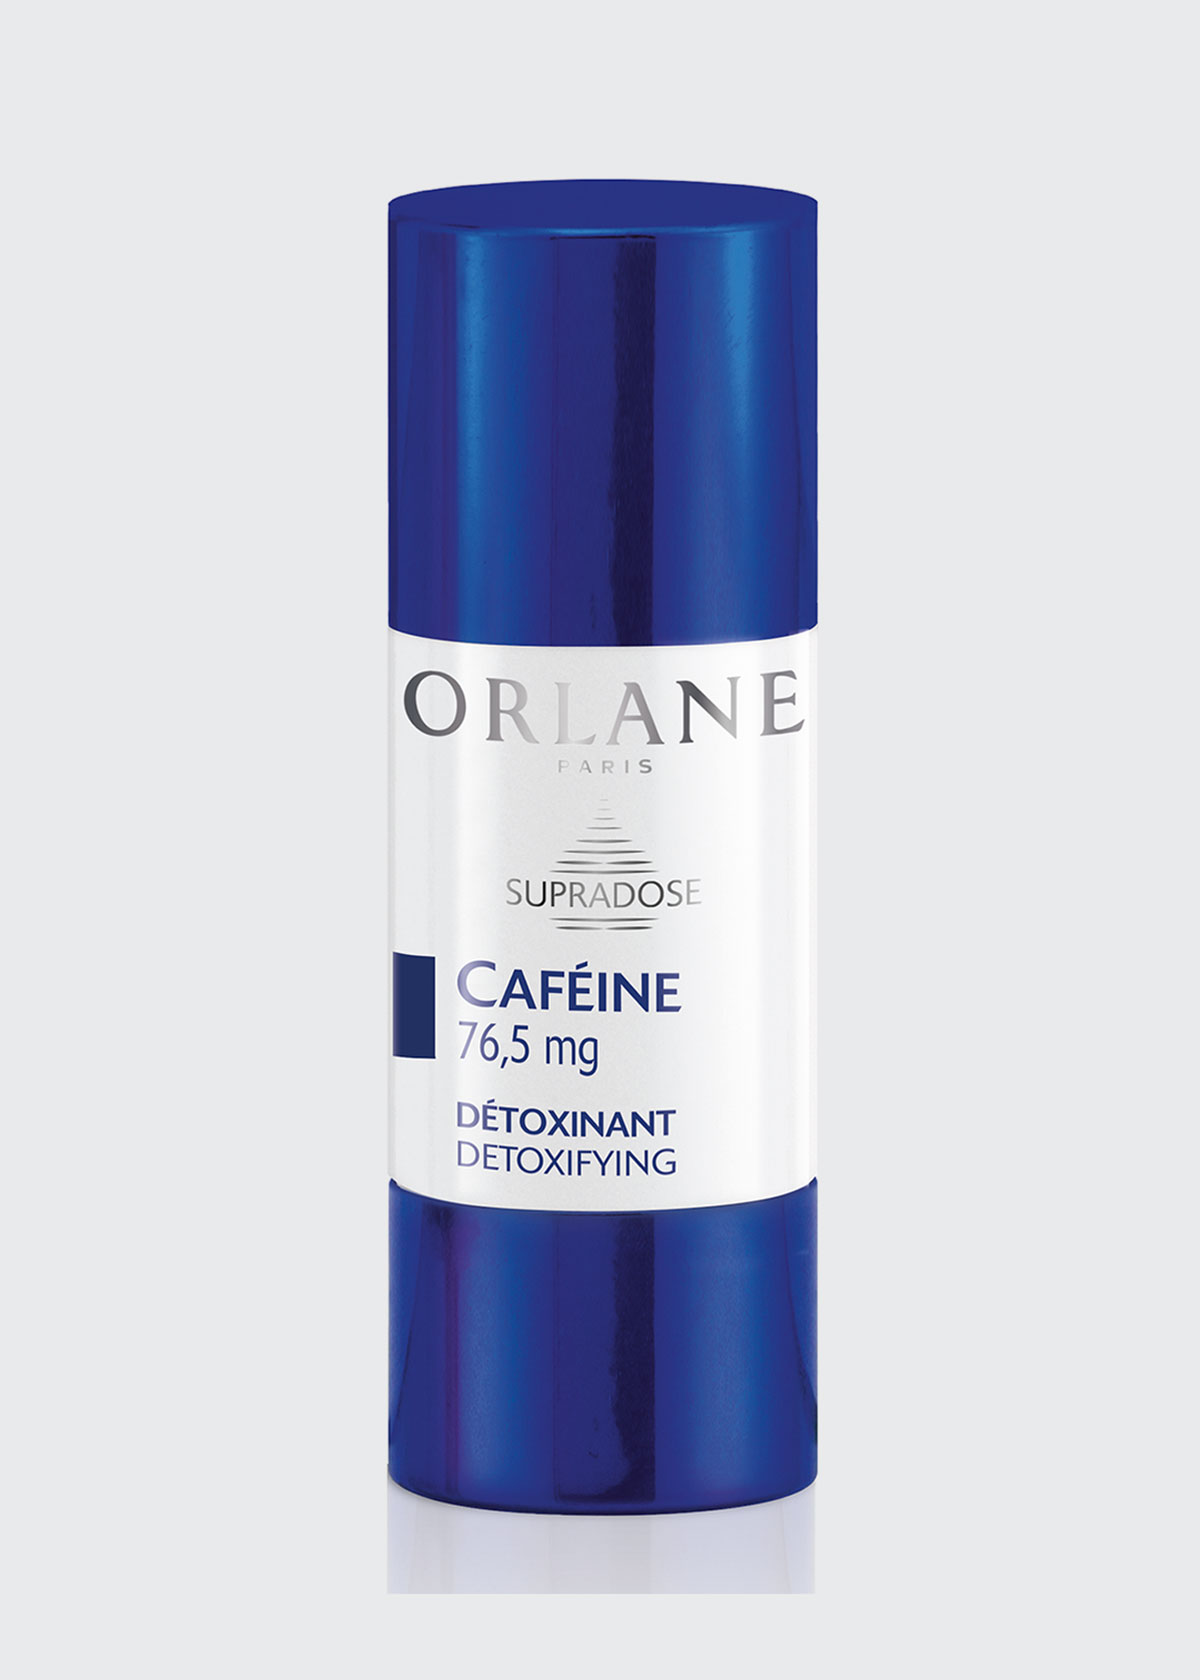 Orlane CAFEINE SUPRADOSE, 0.5 OZ./ 15 ML